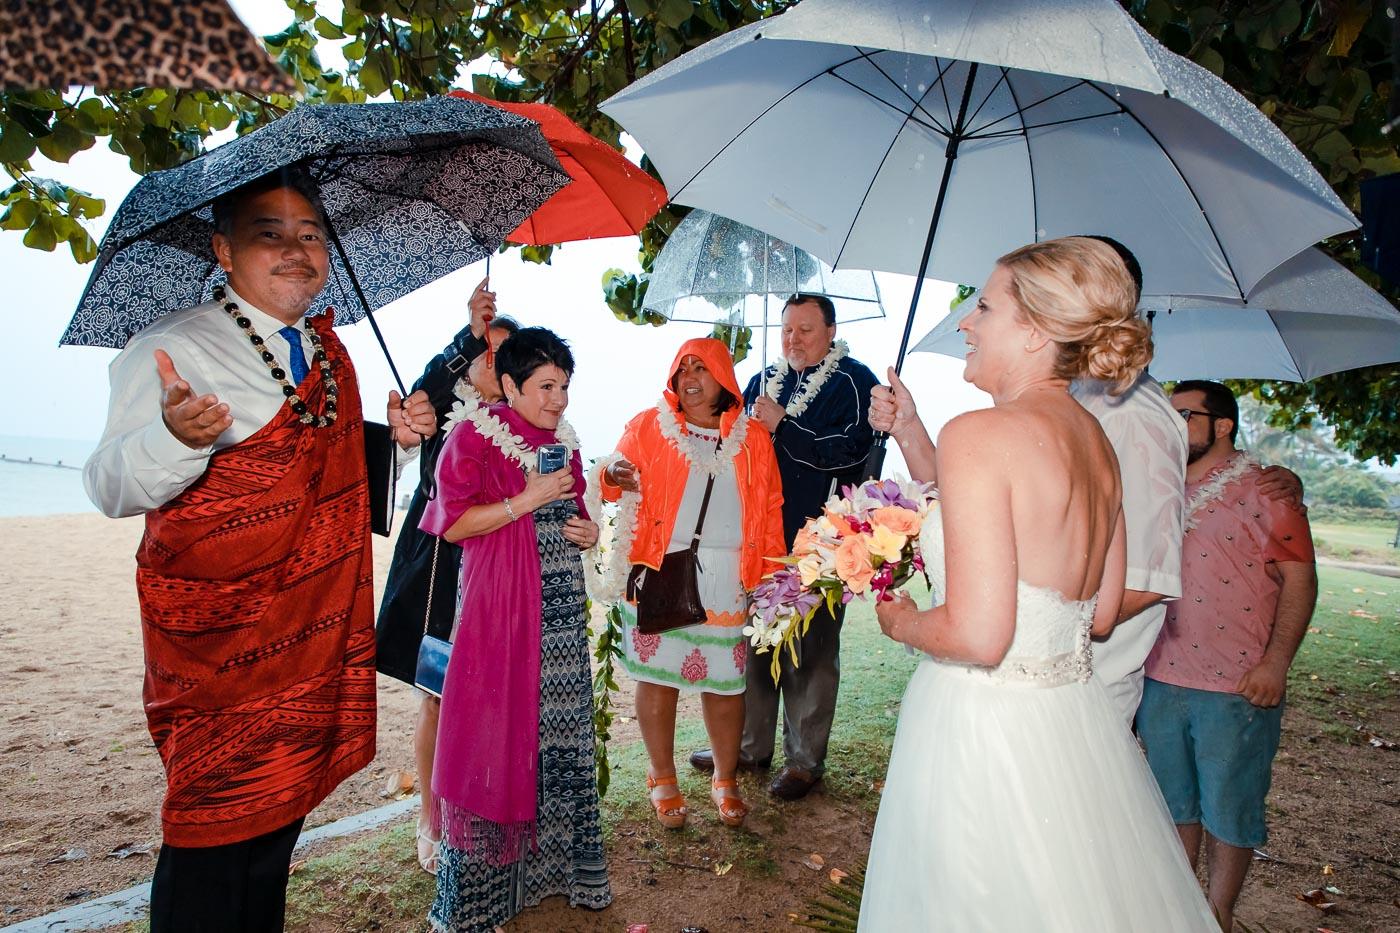 rainy beach wedding ceremony oahu hawaii